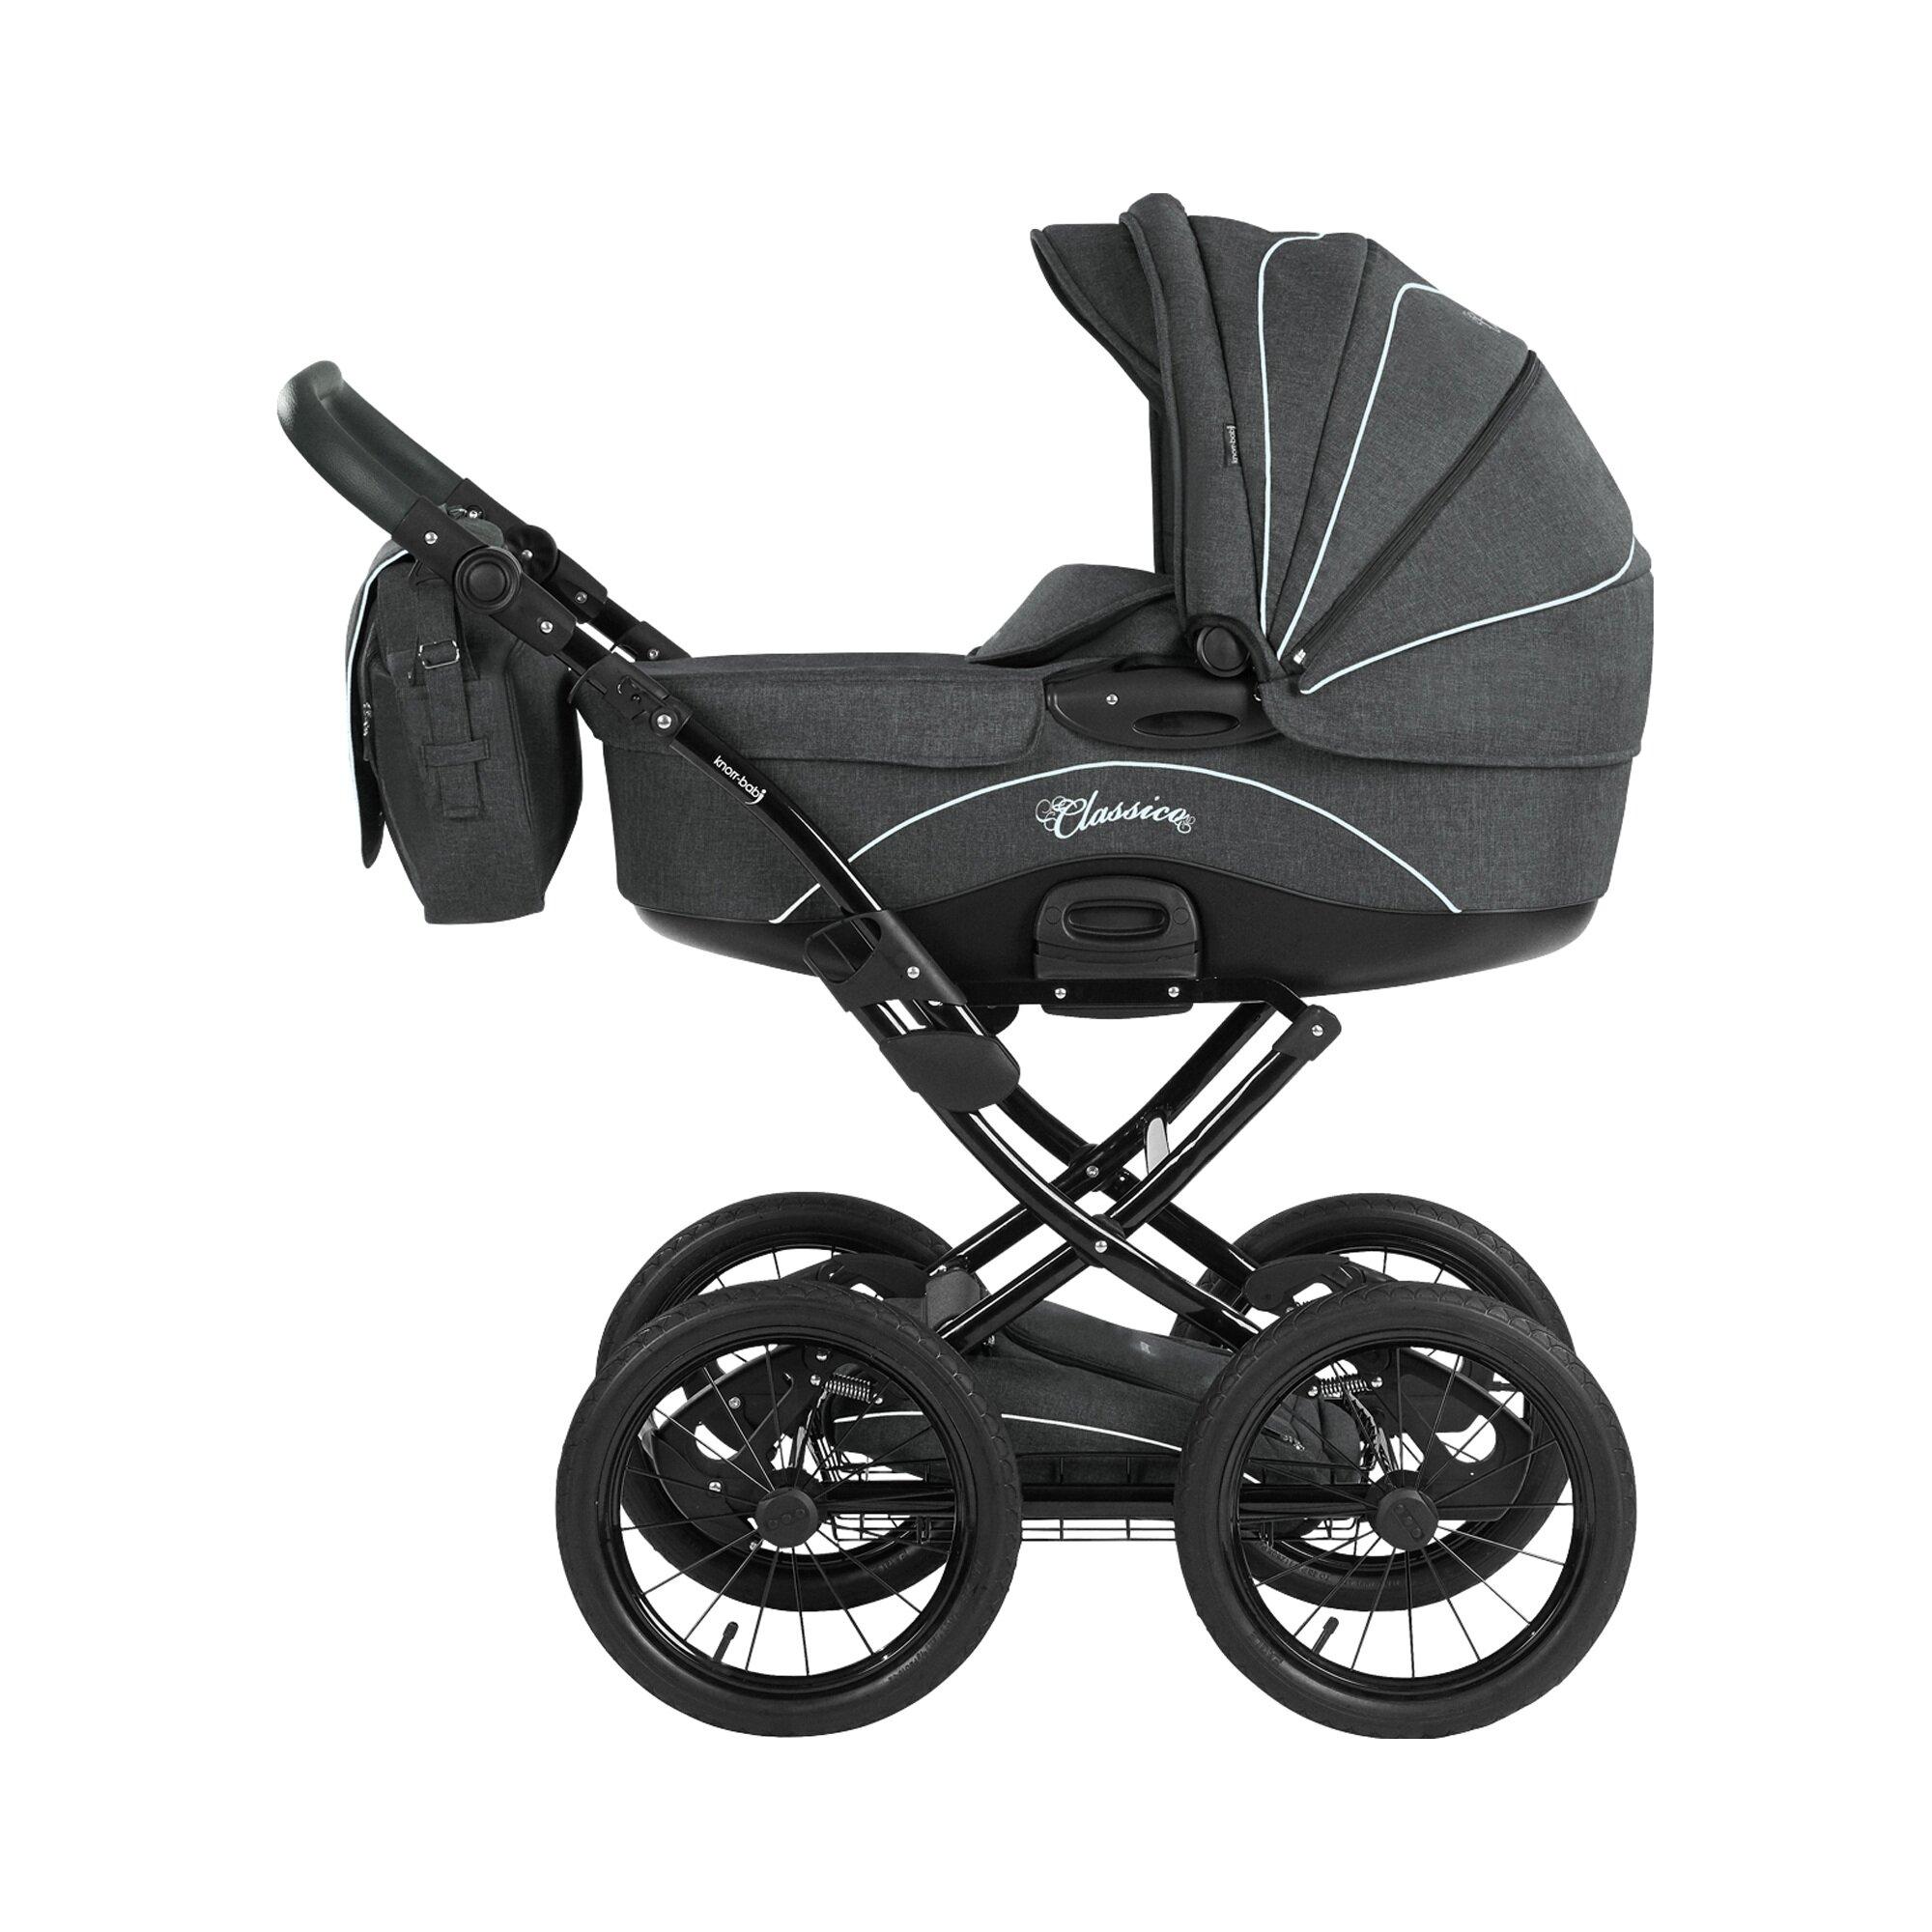 knorr-baby-classico-kombikinderwagen-grau